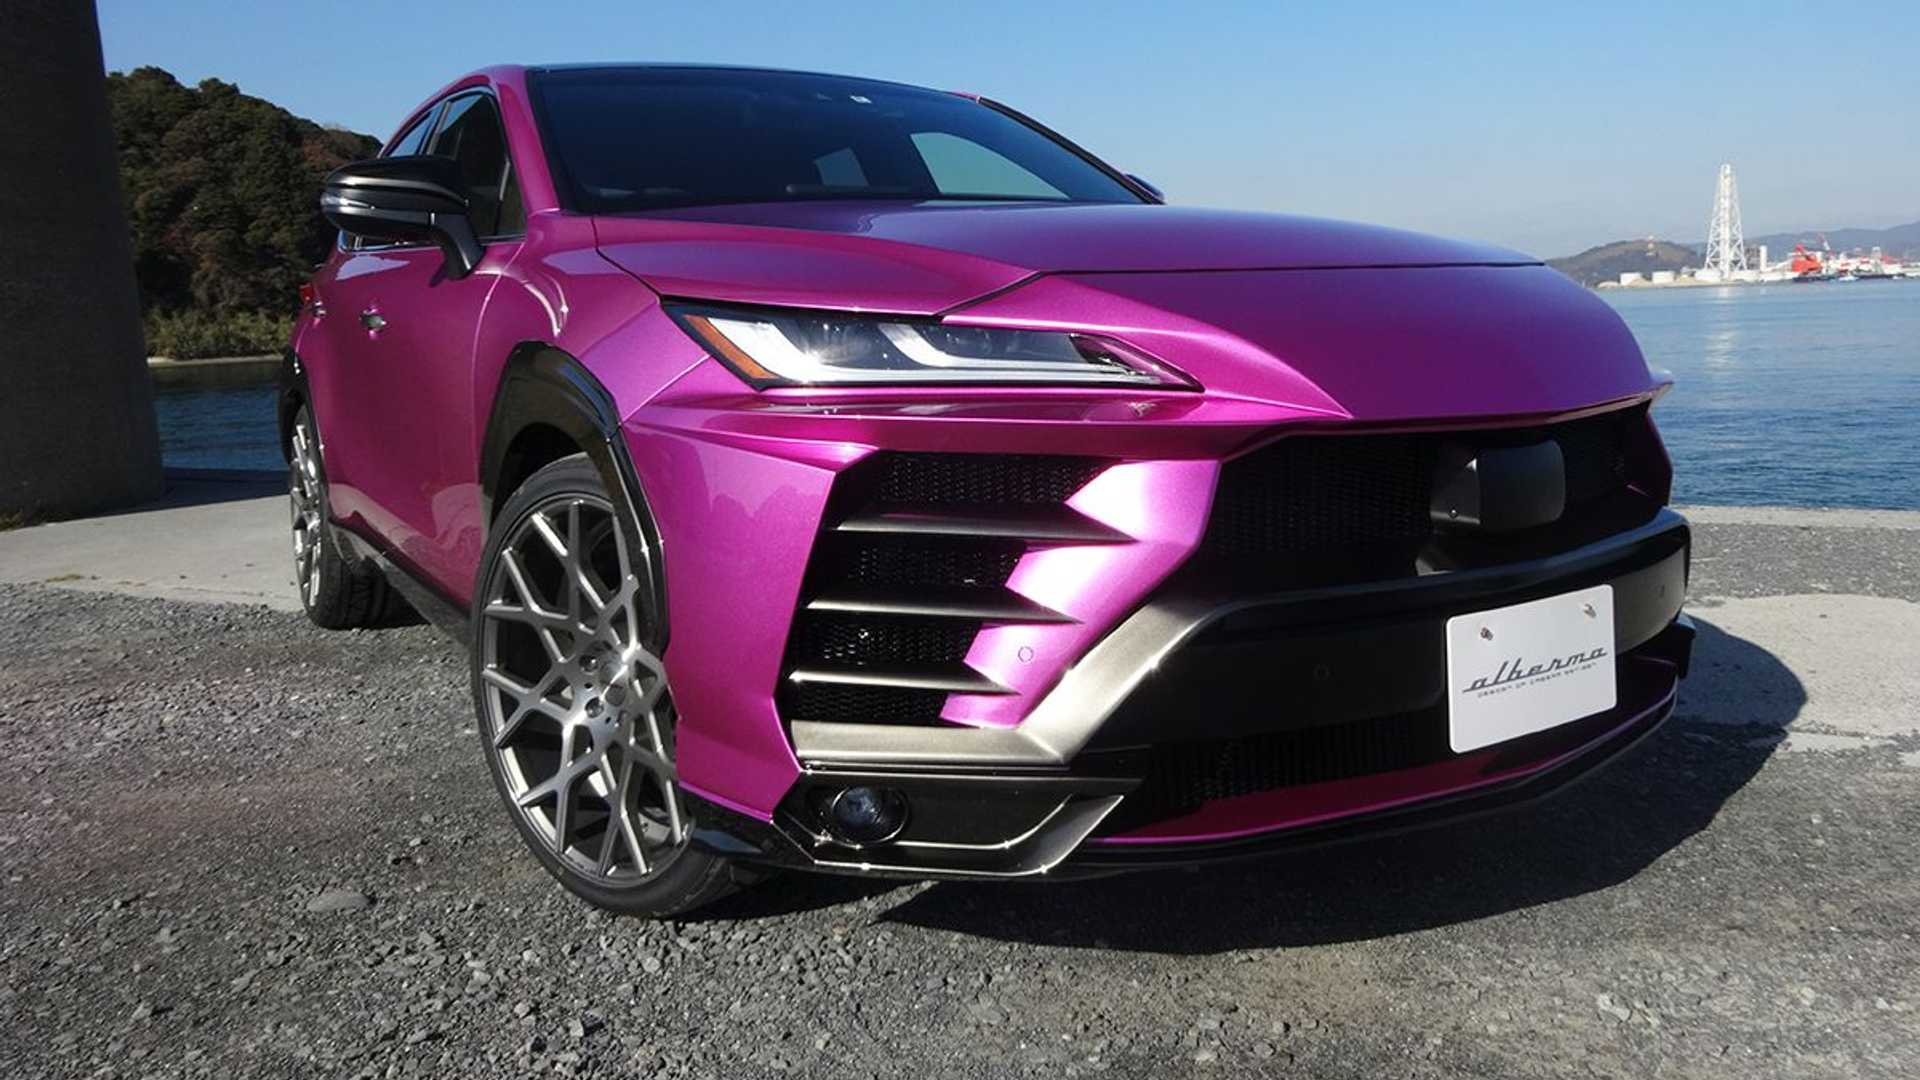 There's A Lamborghini Urus Body Kit For Your New Toyota Venza